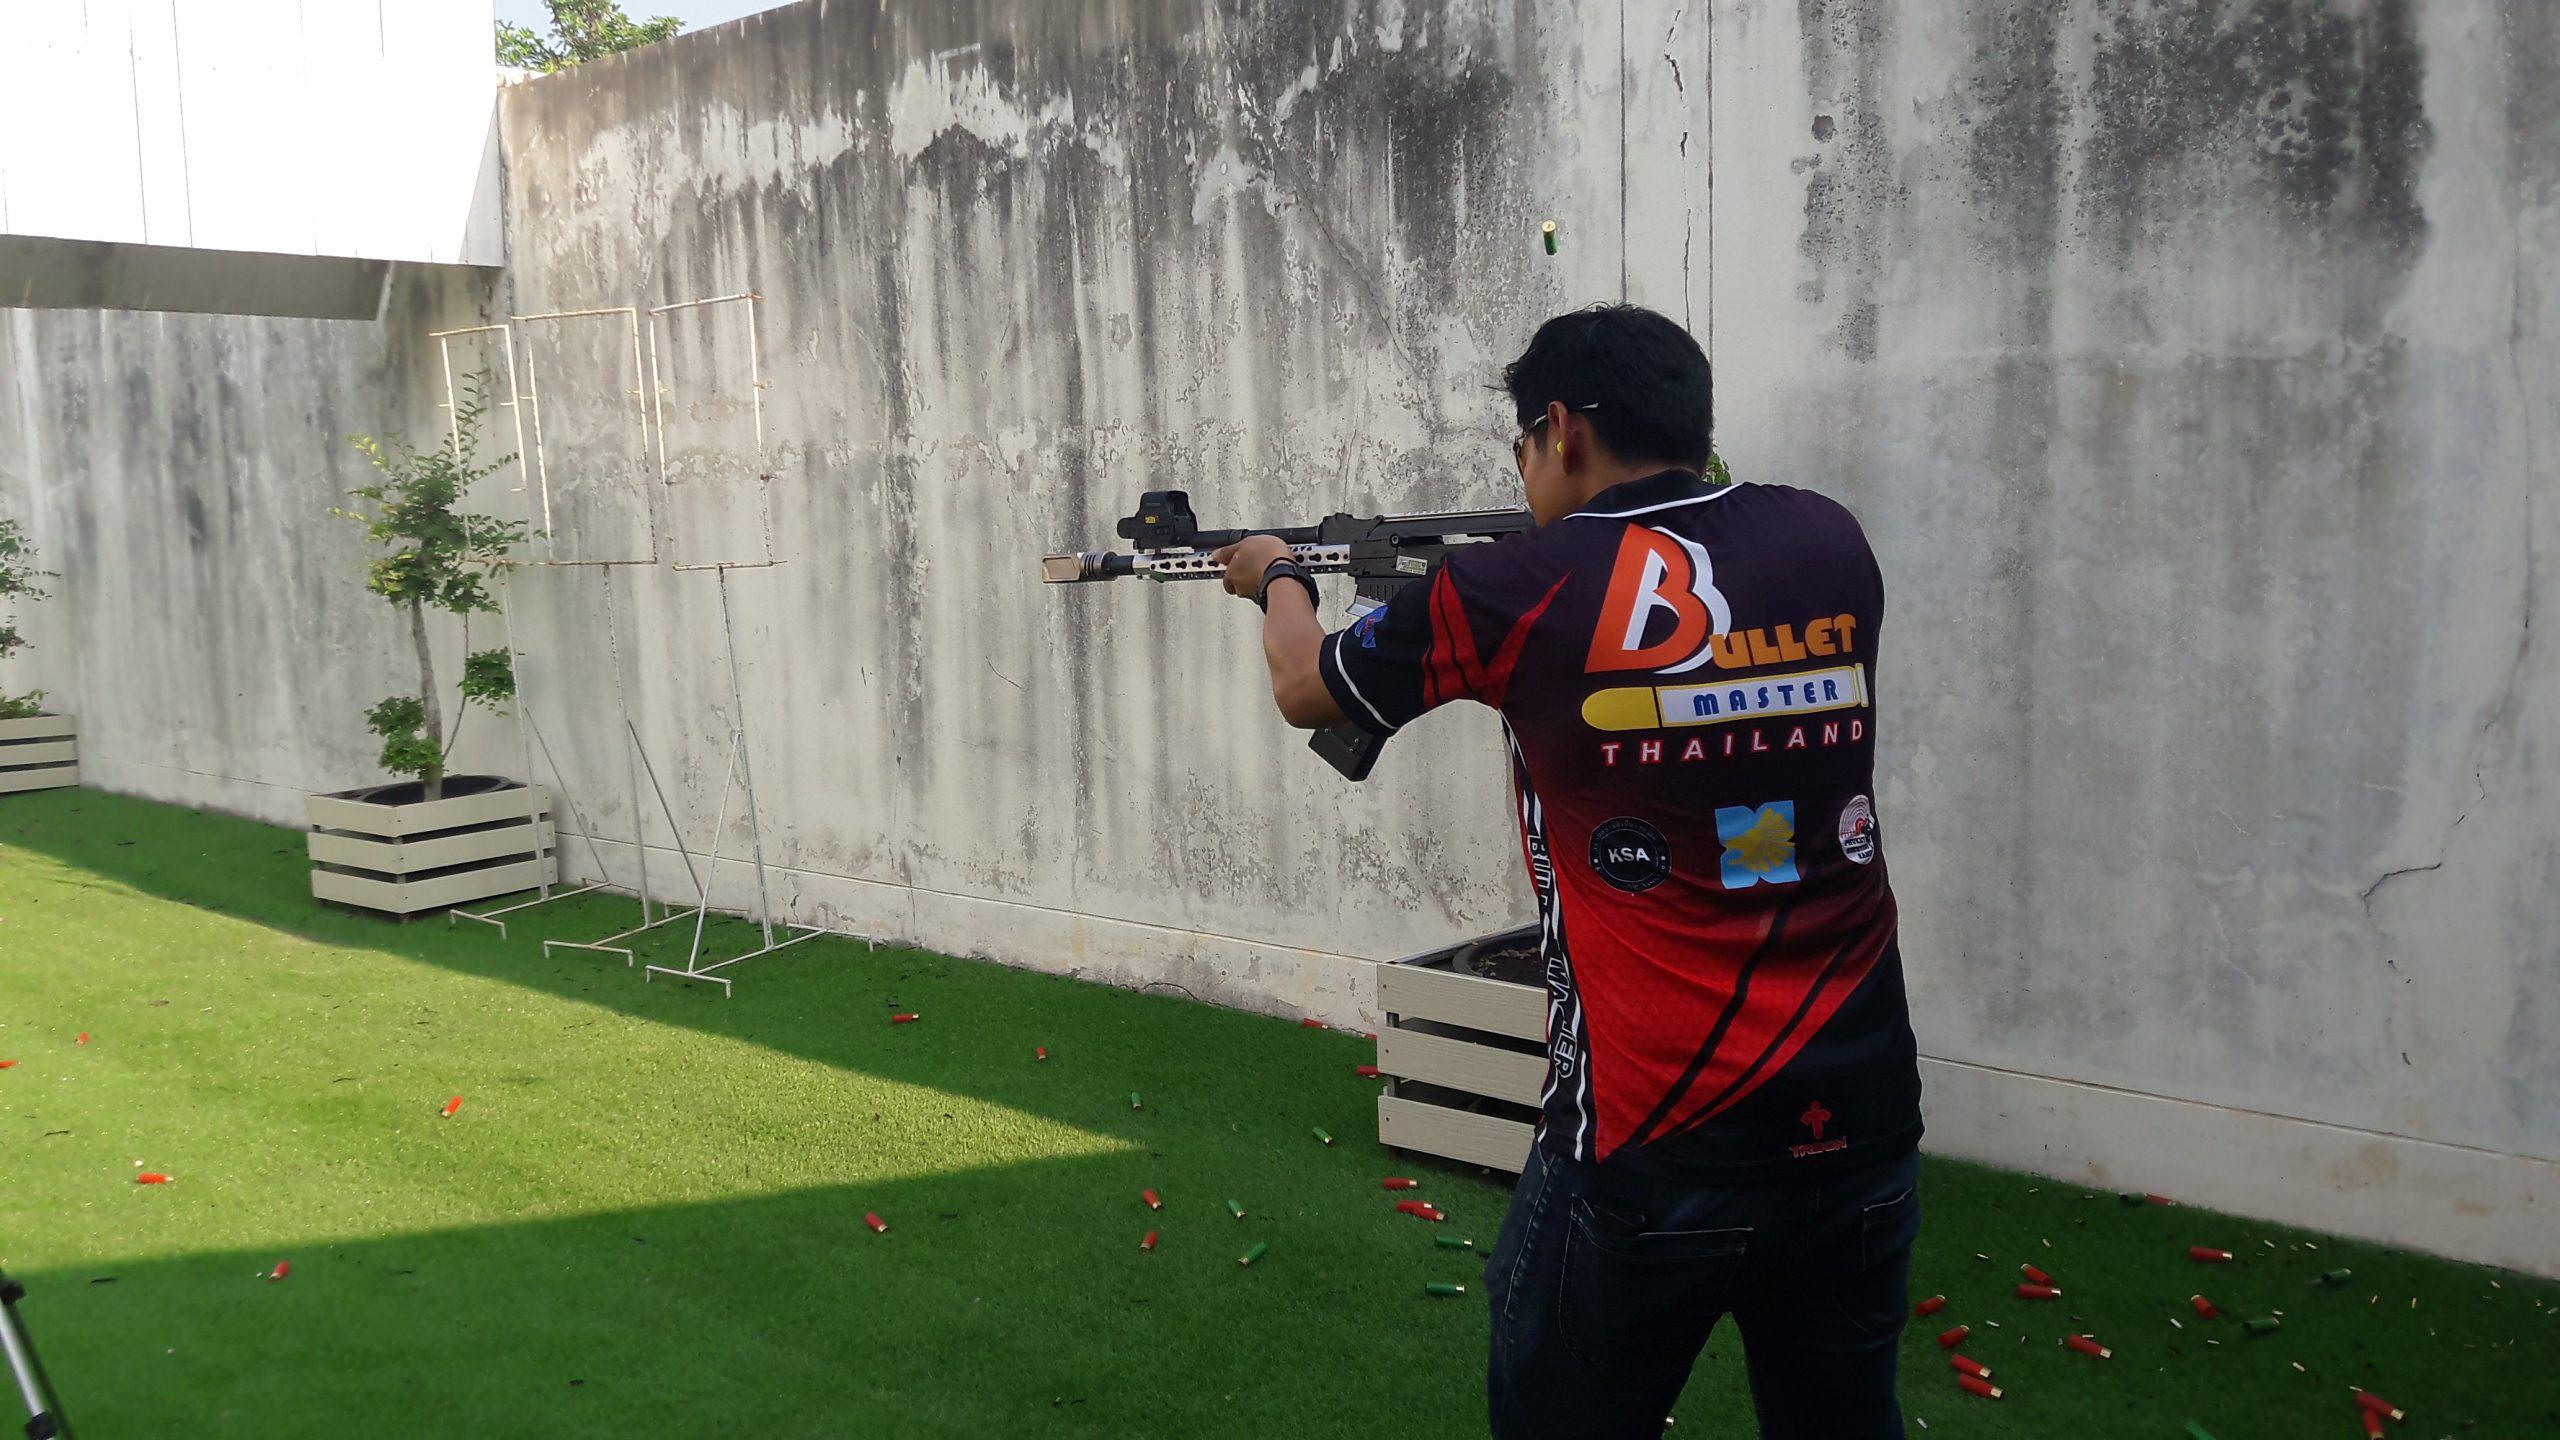 Bullet Master Team Clip By  Kachen Jeakkhachorn